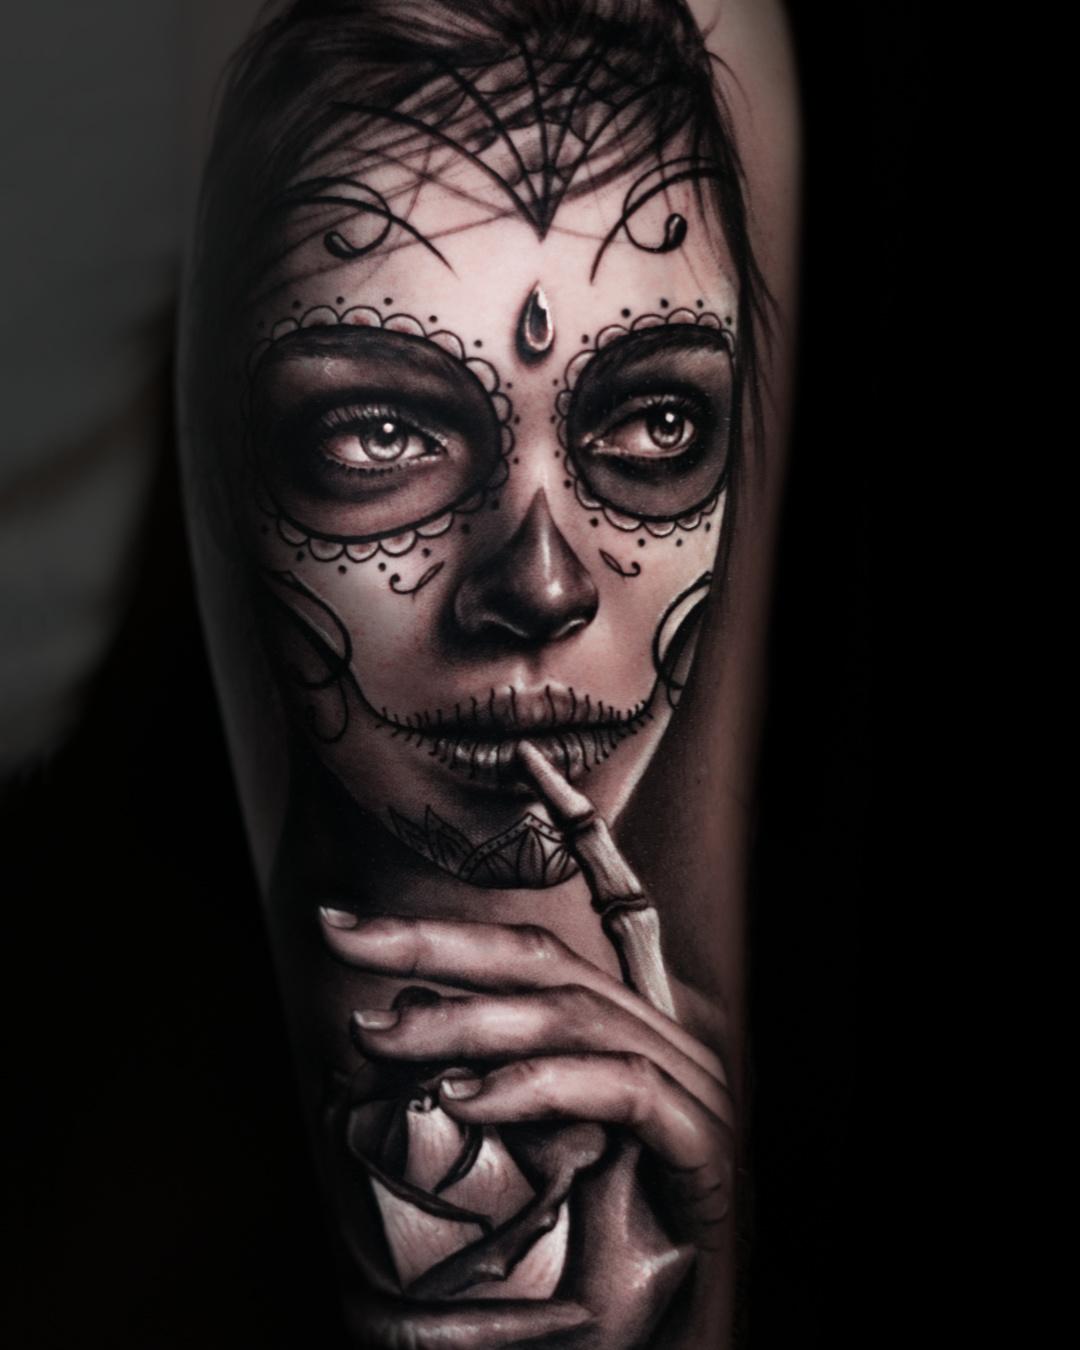 Tattoo tatuaje Alexis Epalza black and grey realistic catrina dia de los muertos girl chicano